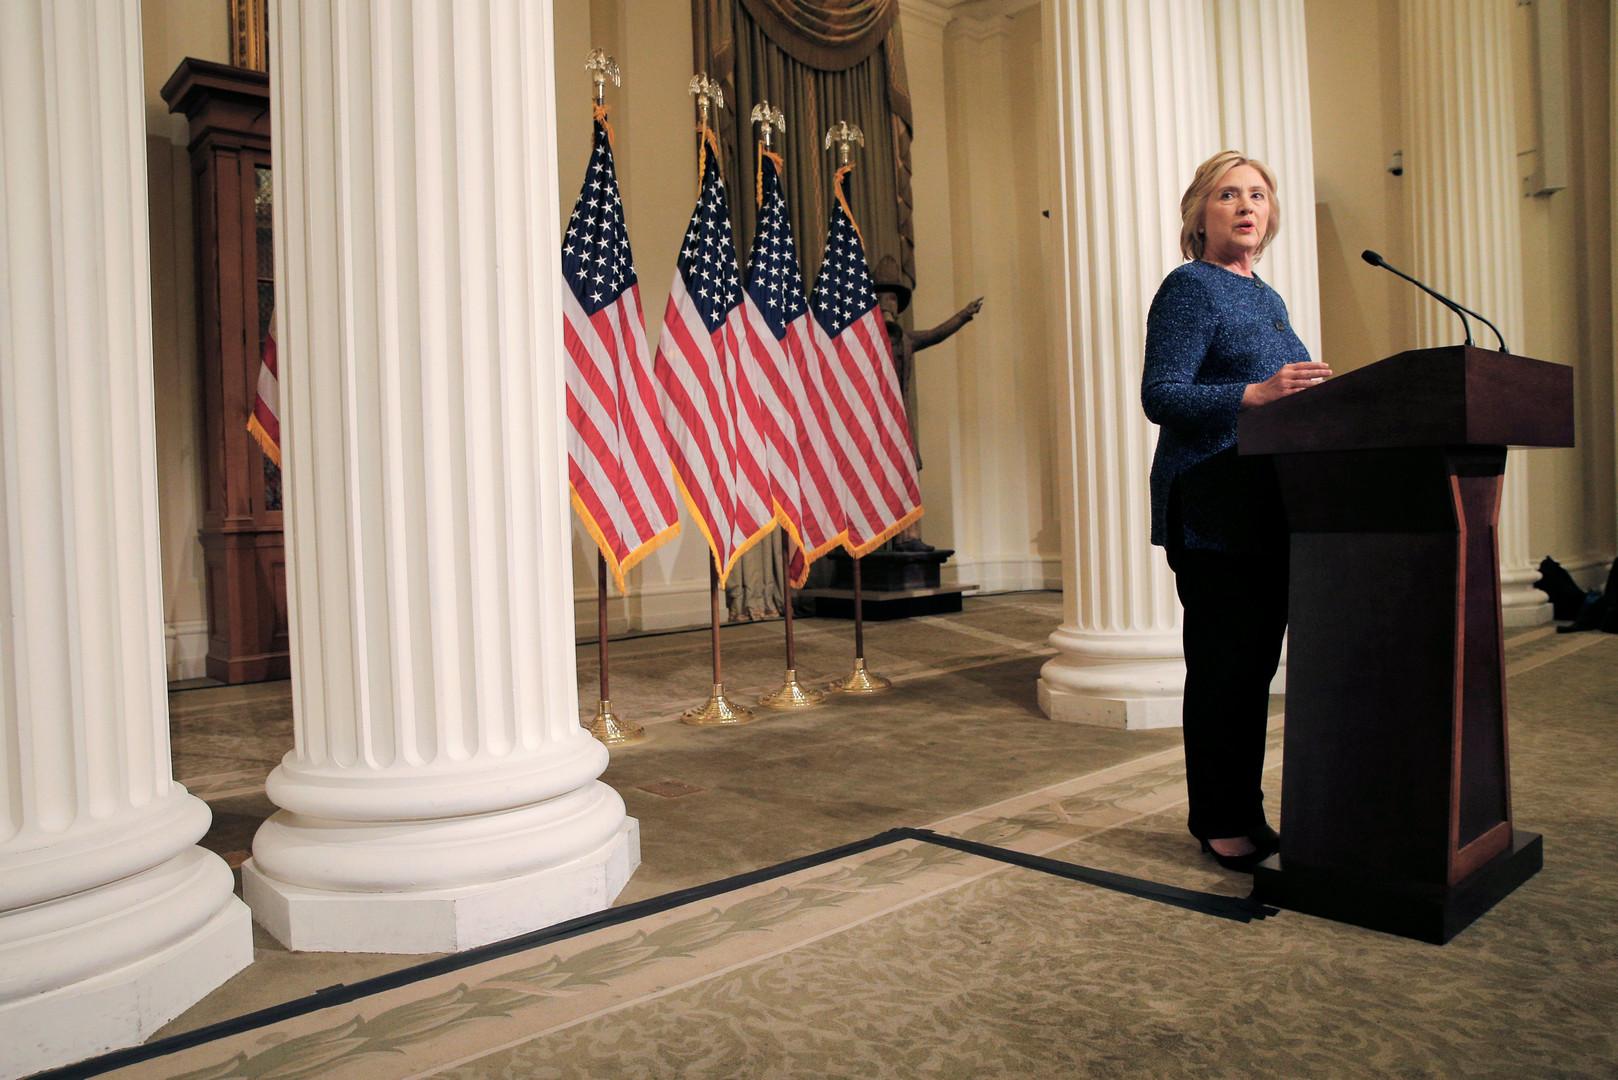 «Определённо разочарована»: Клинтон не понравилось интервью Трампа на RT